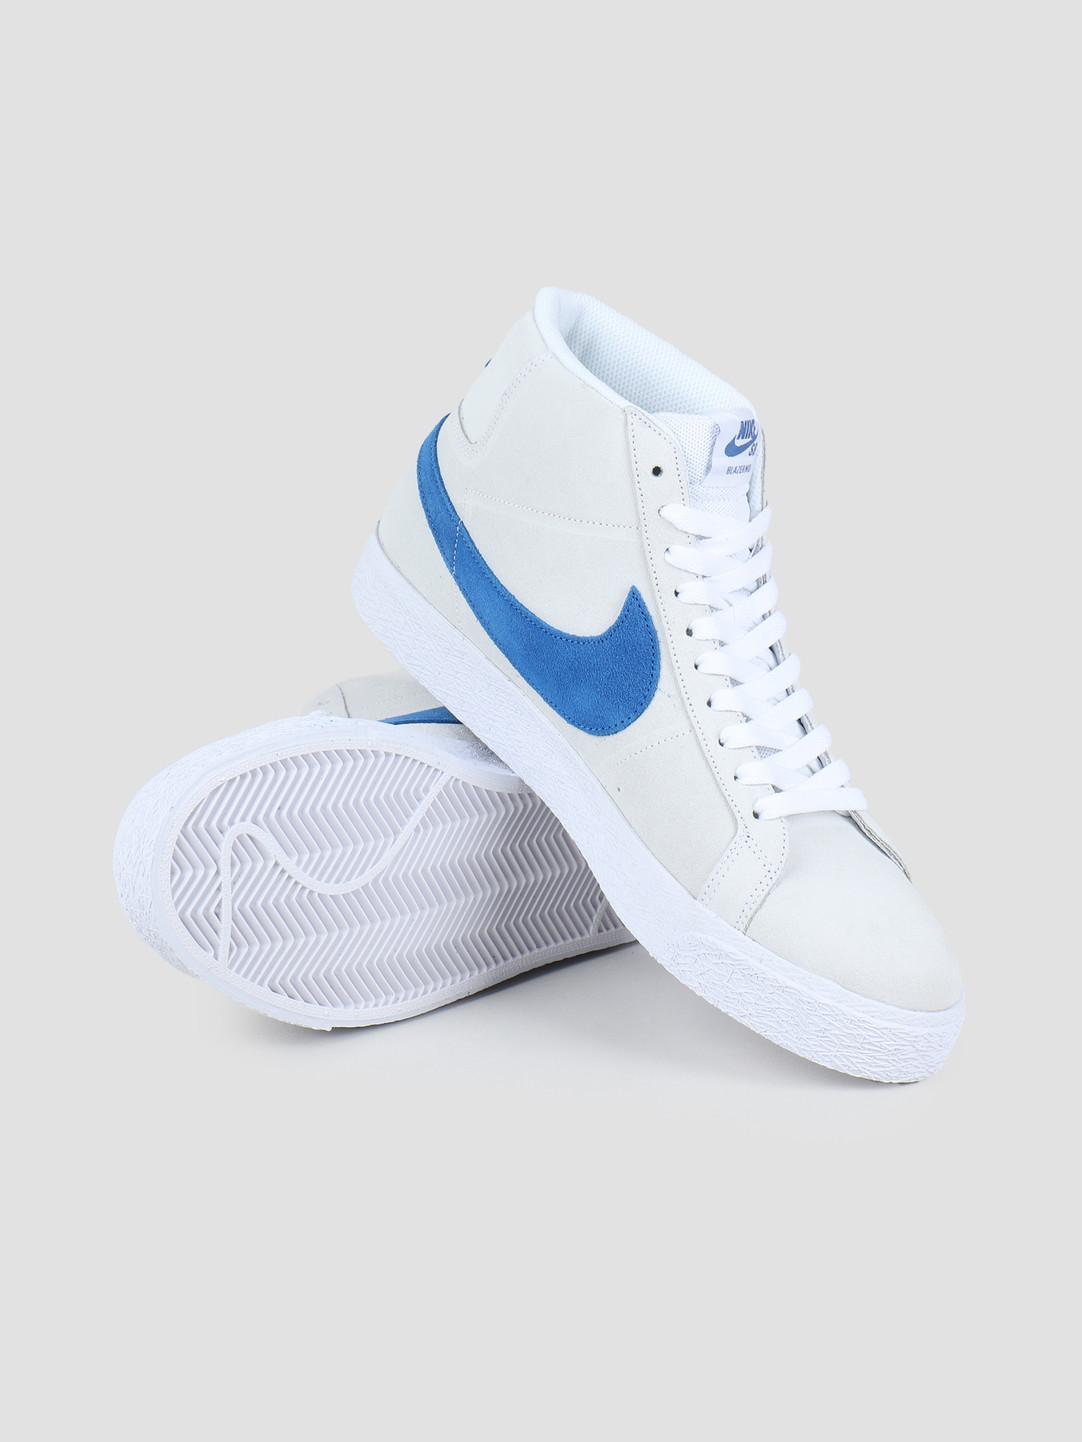 Nike SB Zoom Blazer Mid White Team Royal White Cerulean 864349 104